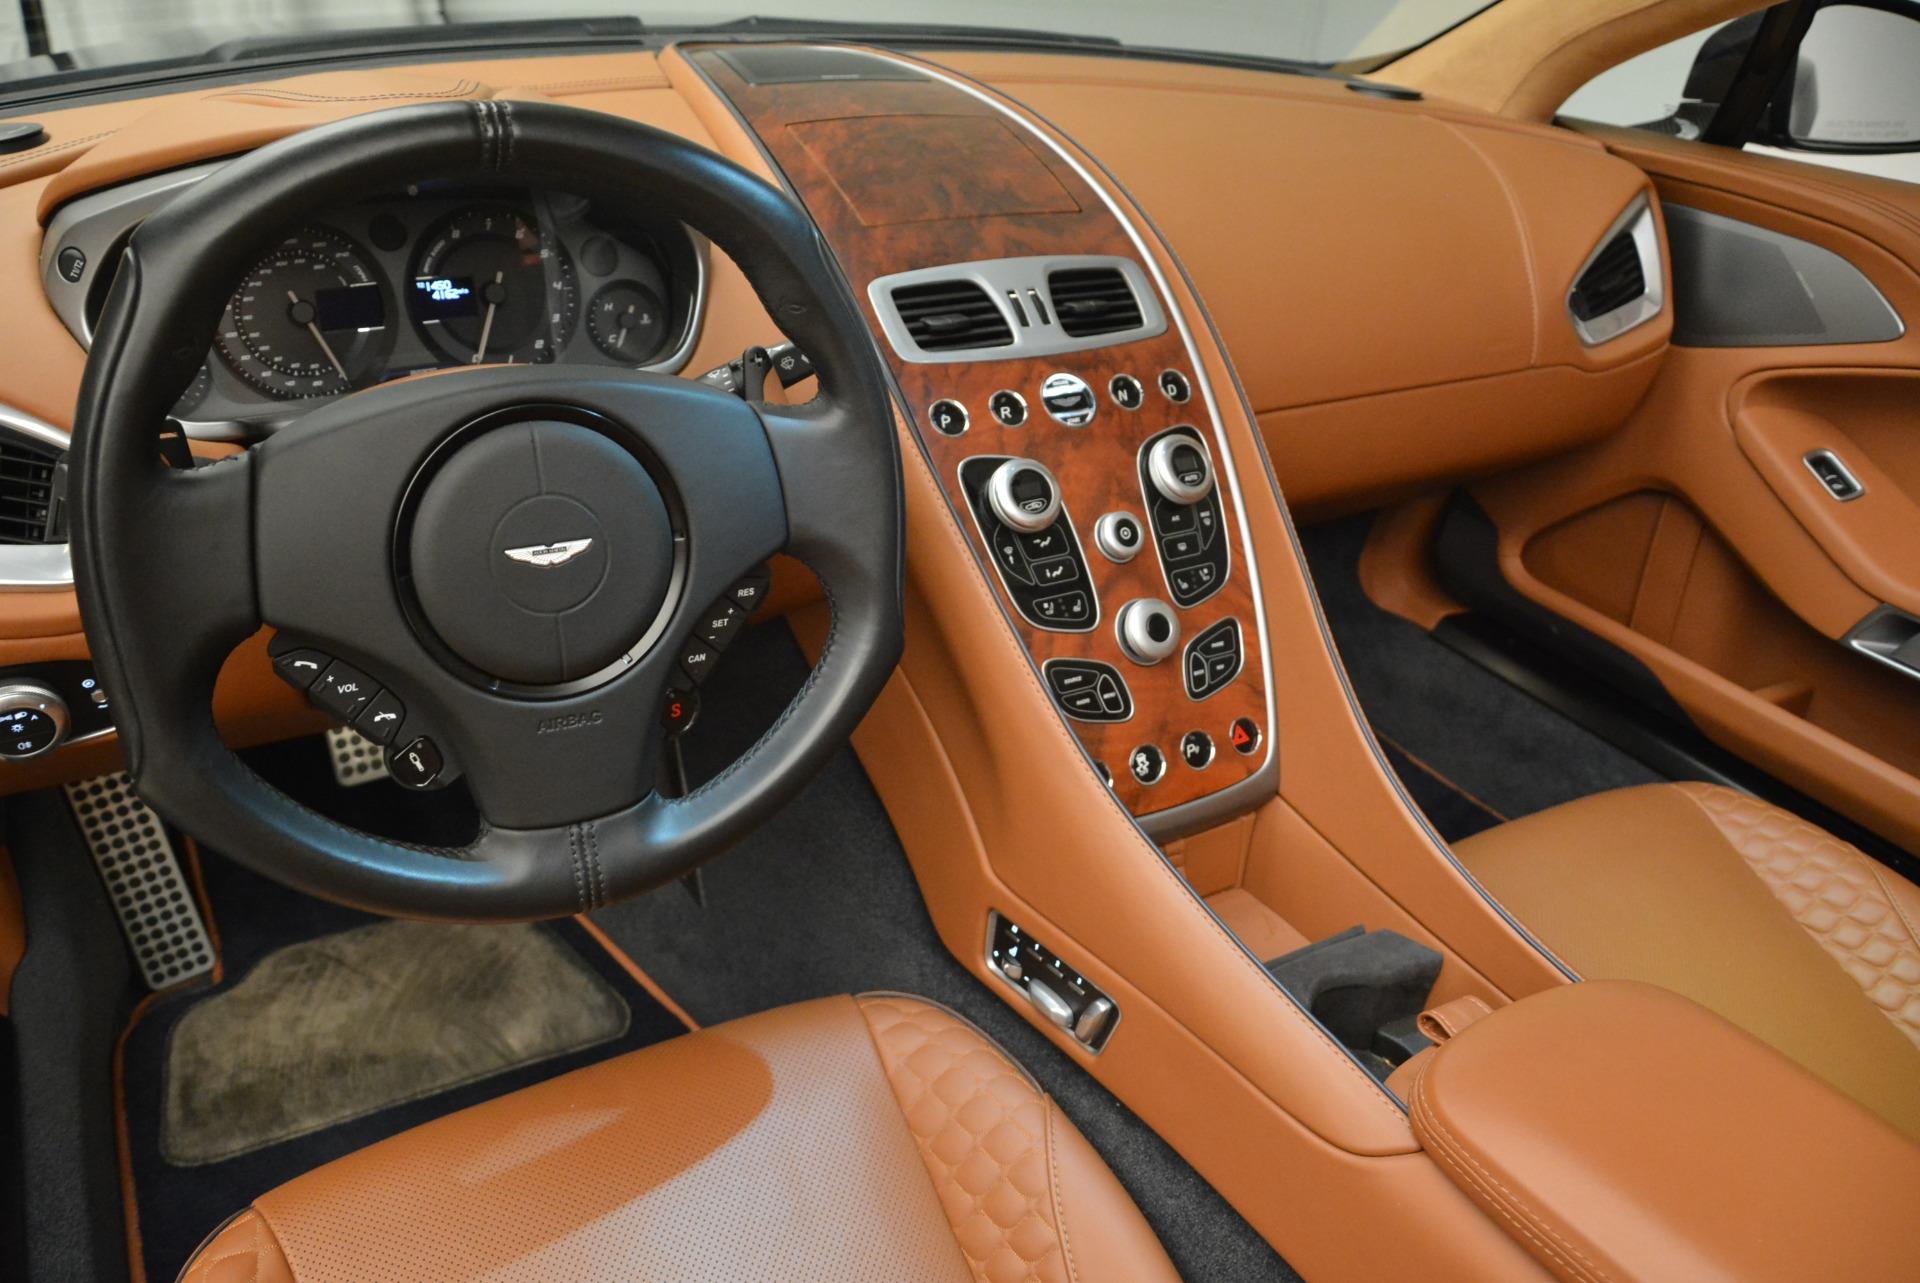 Used 2014 Aston Martin Vanquish Volante For Sale In Greenwich, CT 2097_p22